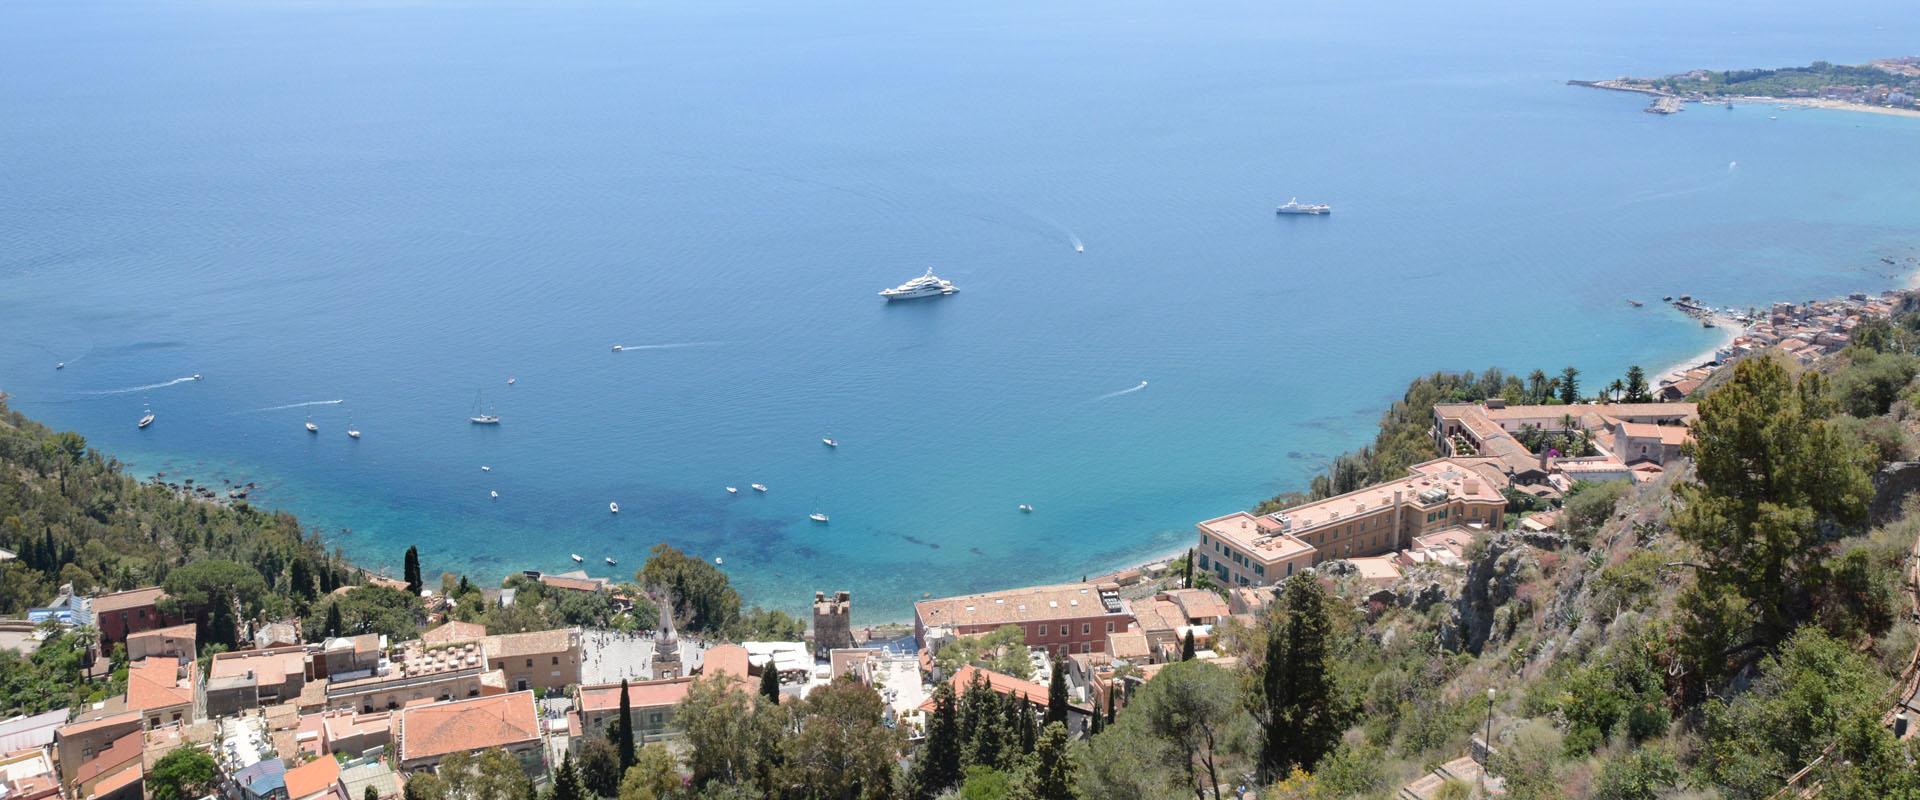 Taormina – czy warto?